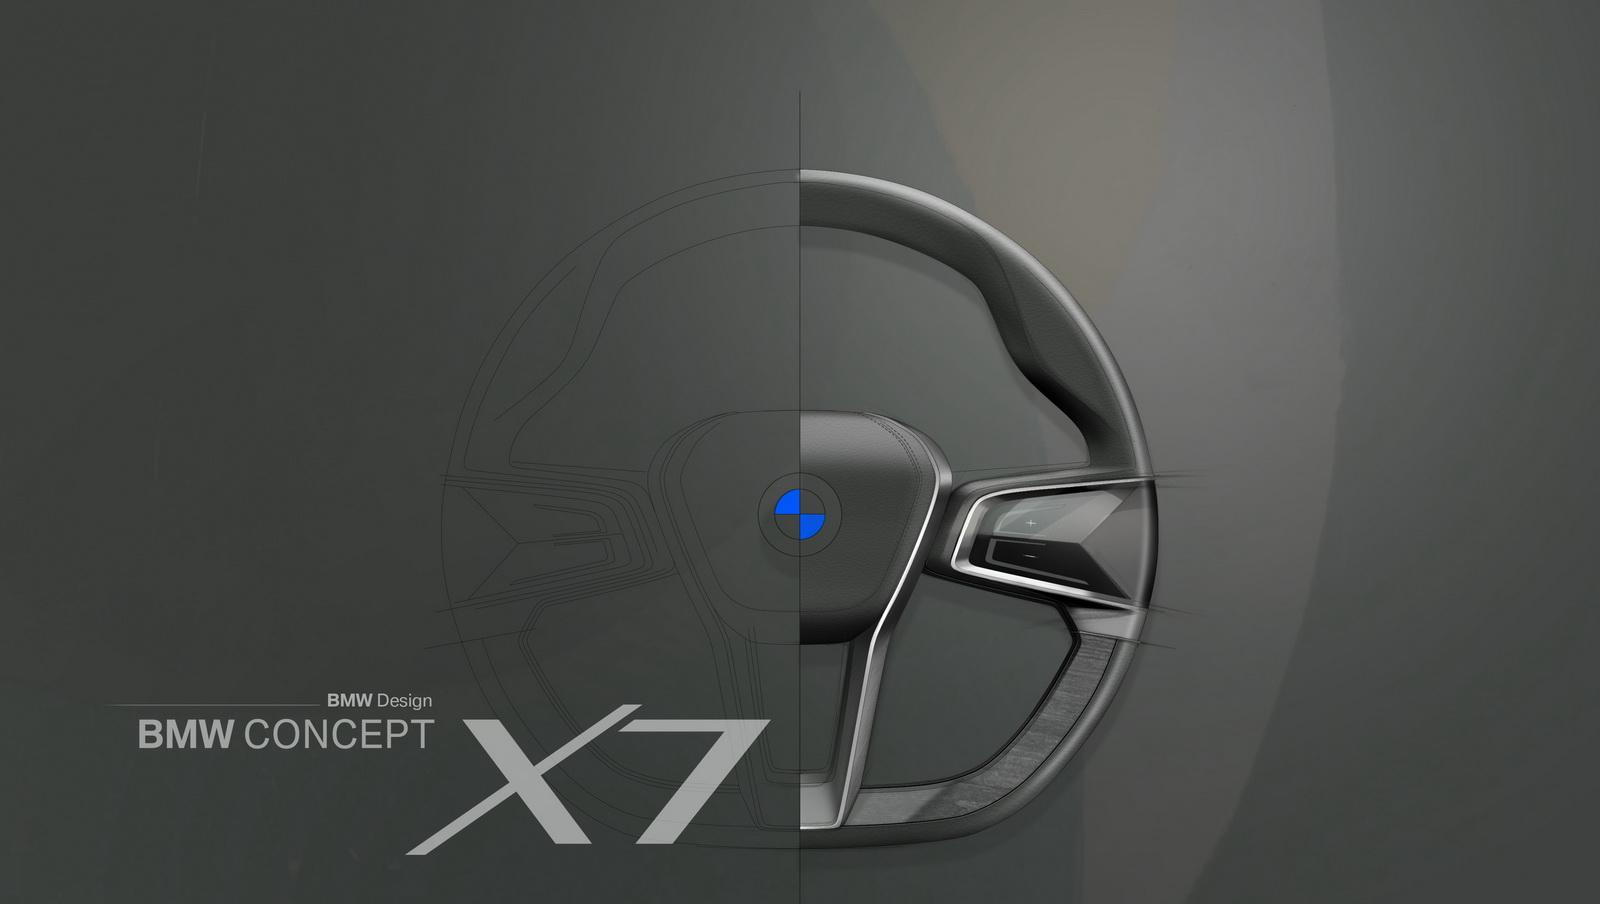 2017 Bmw X7 Iperformance Concepts